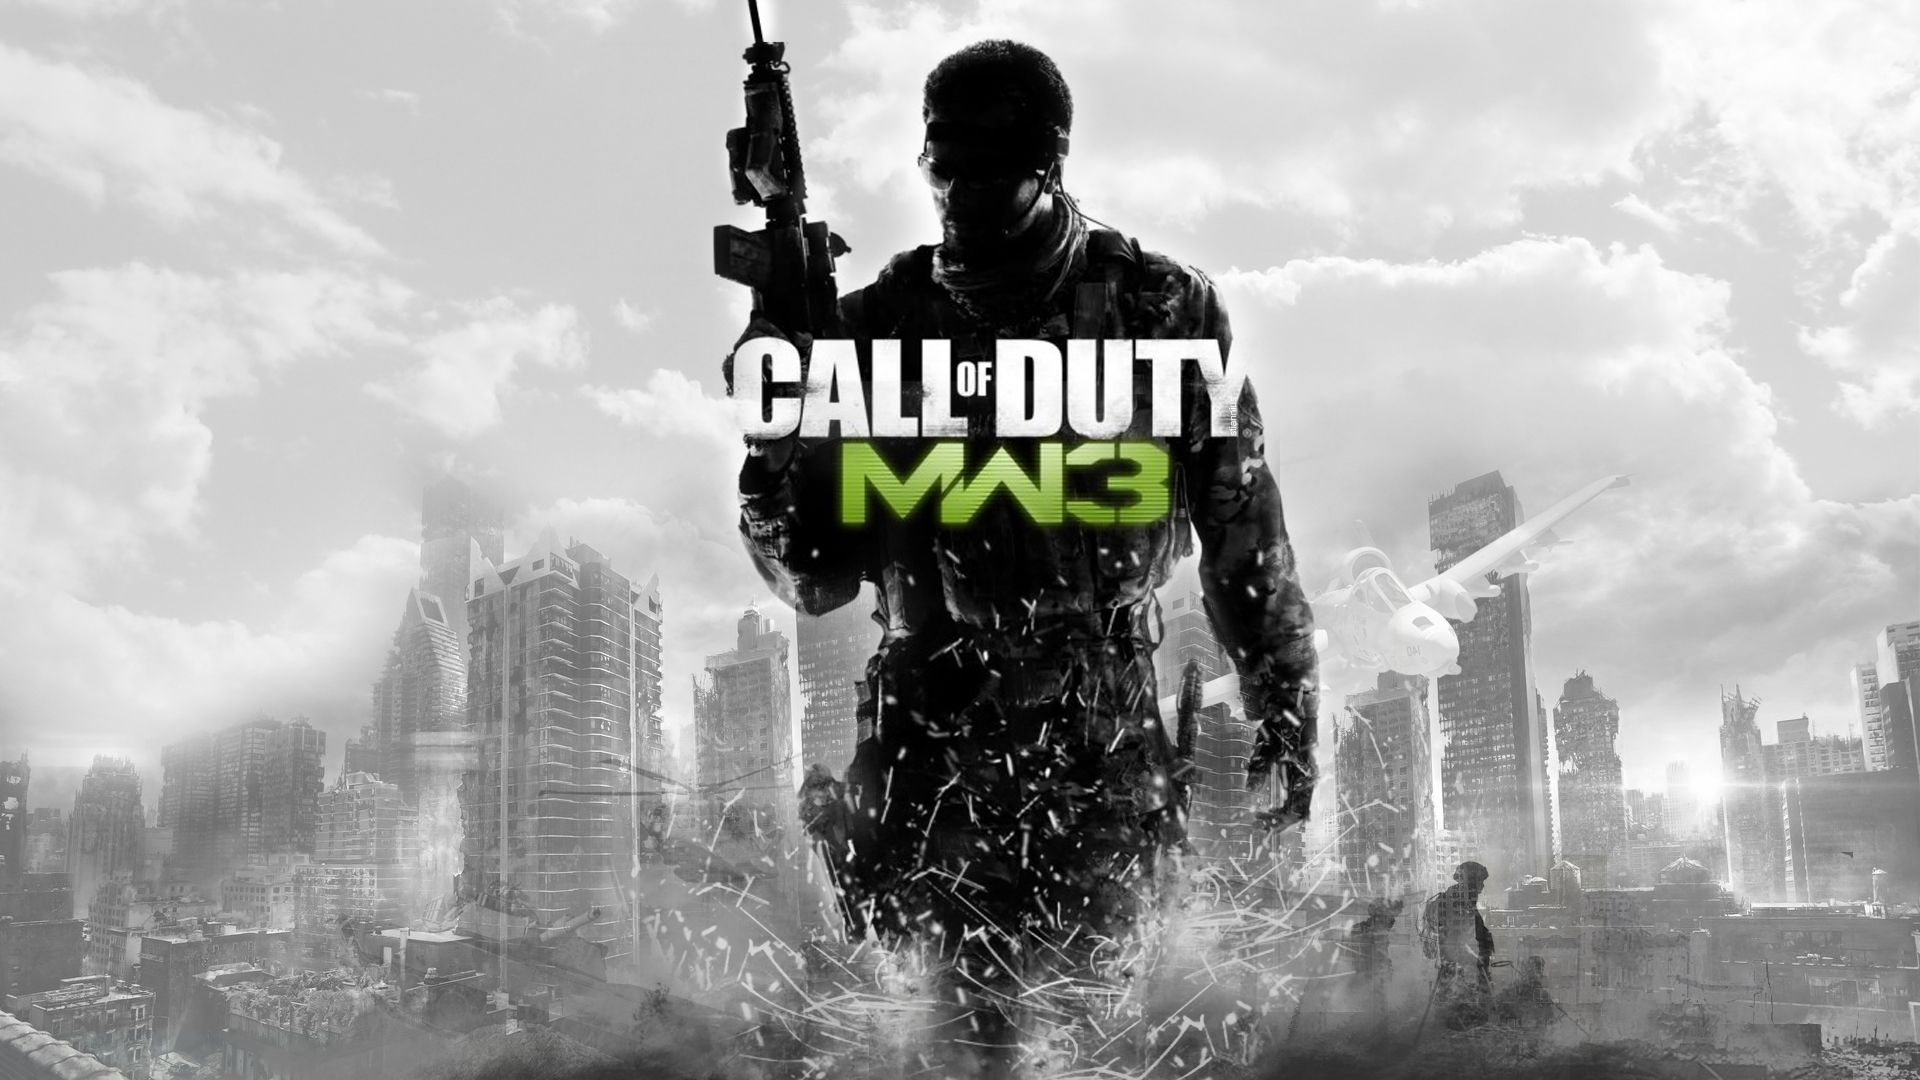 دانلود ترینر بازی CALL OF DUTY: MODERN WARFARE 3 (mw3